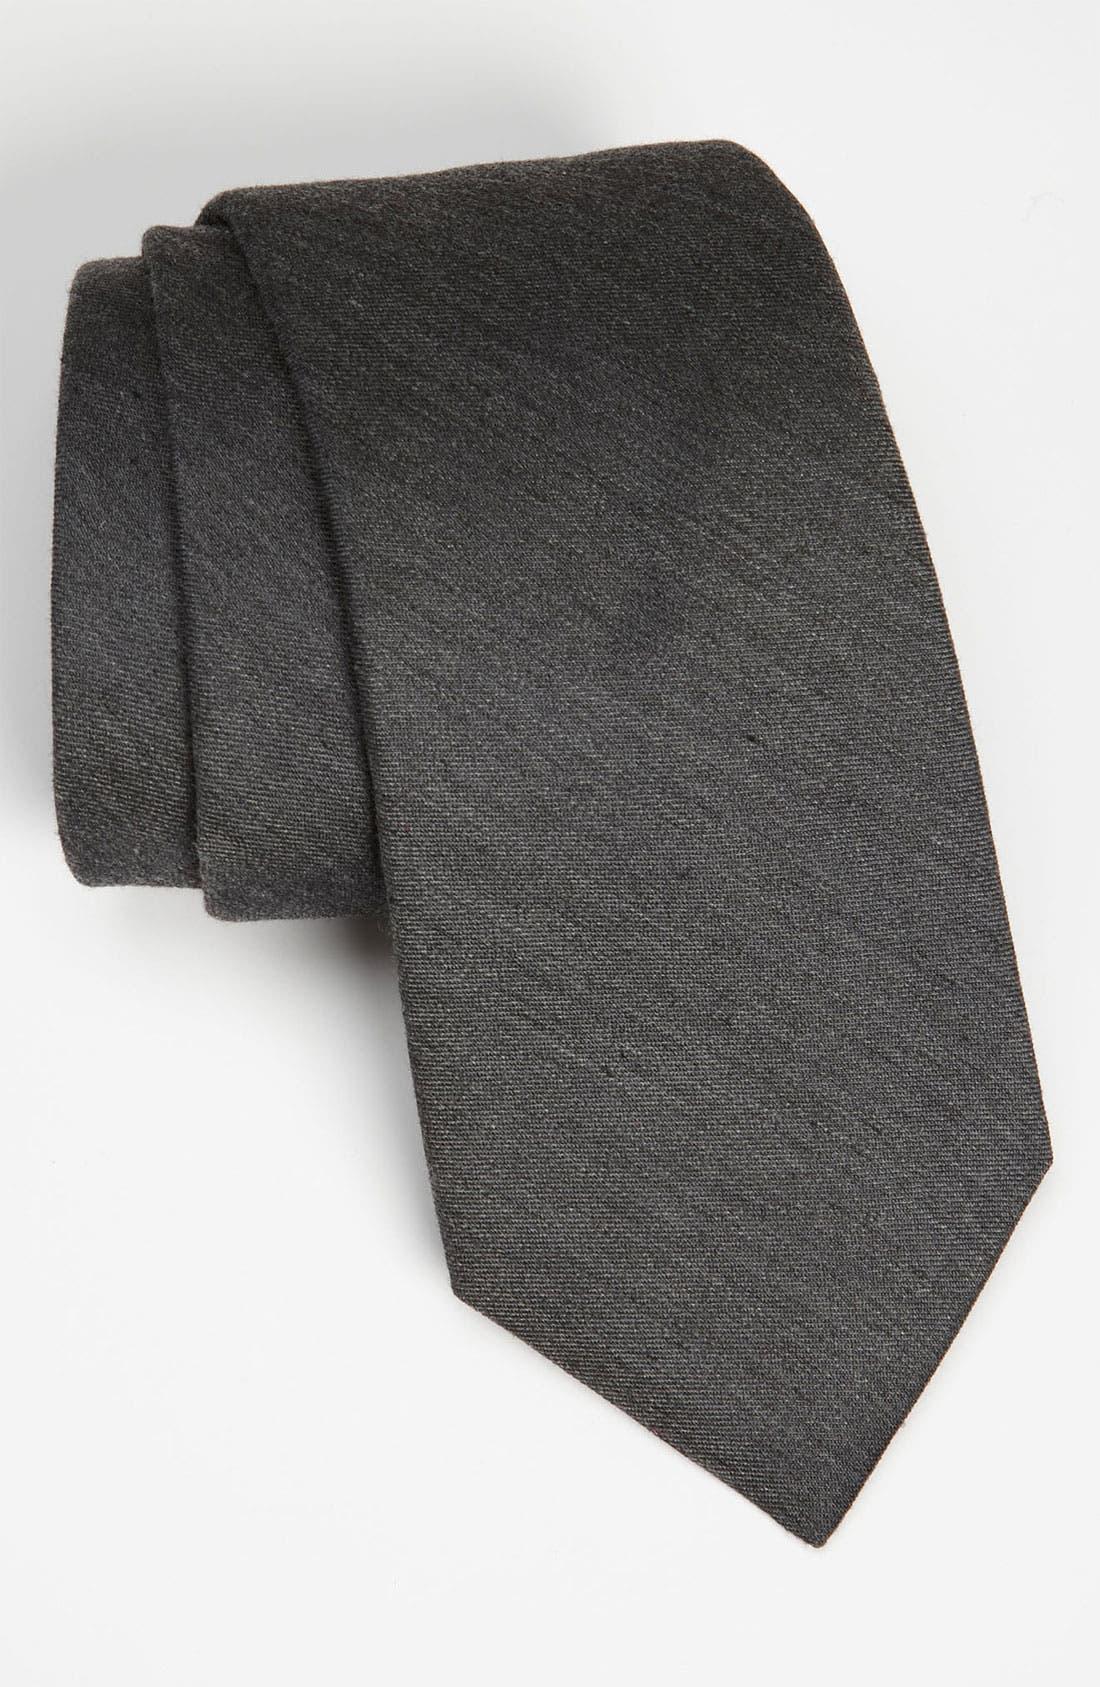 Alternate Image 1 Selected - Michael Kors Woven Silk Blend Tie